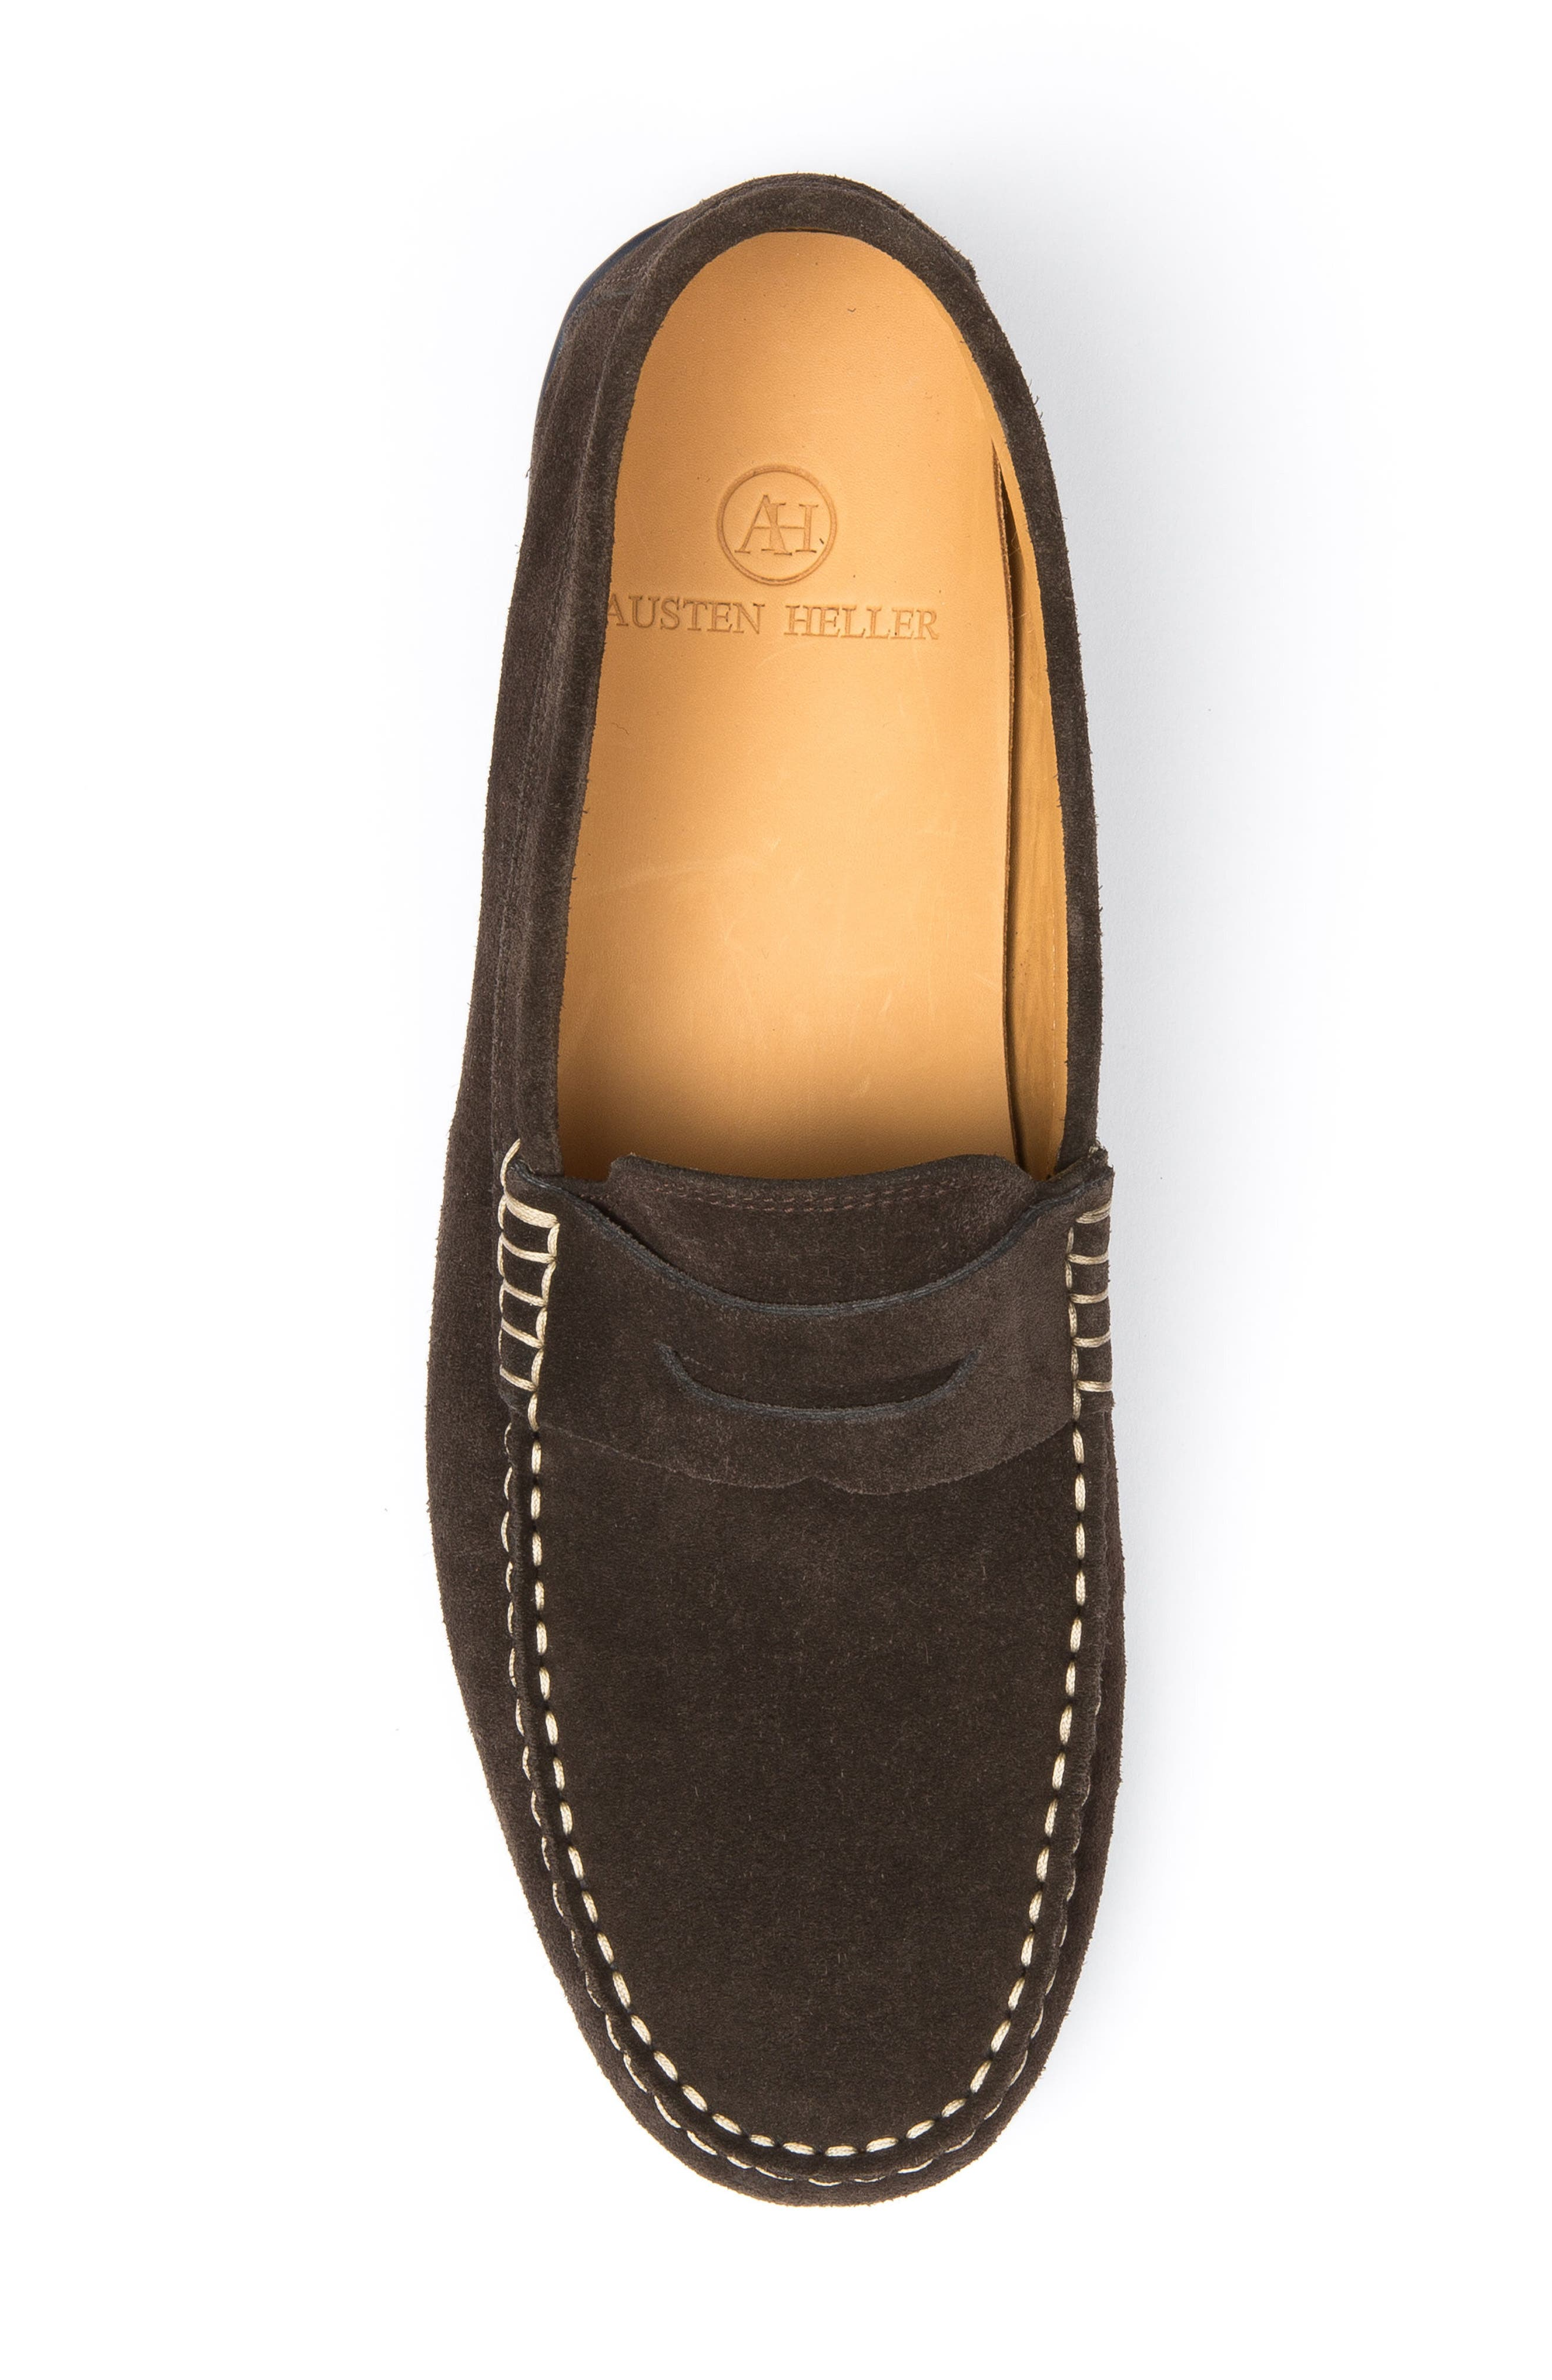 Alternate Image 5  - Austen Heller Biltmores Driving Shoe (Men)